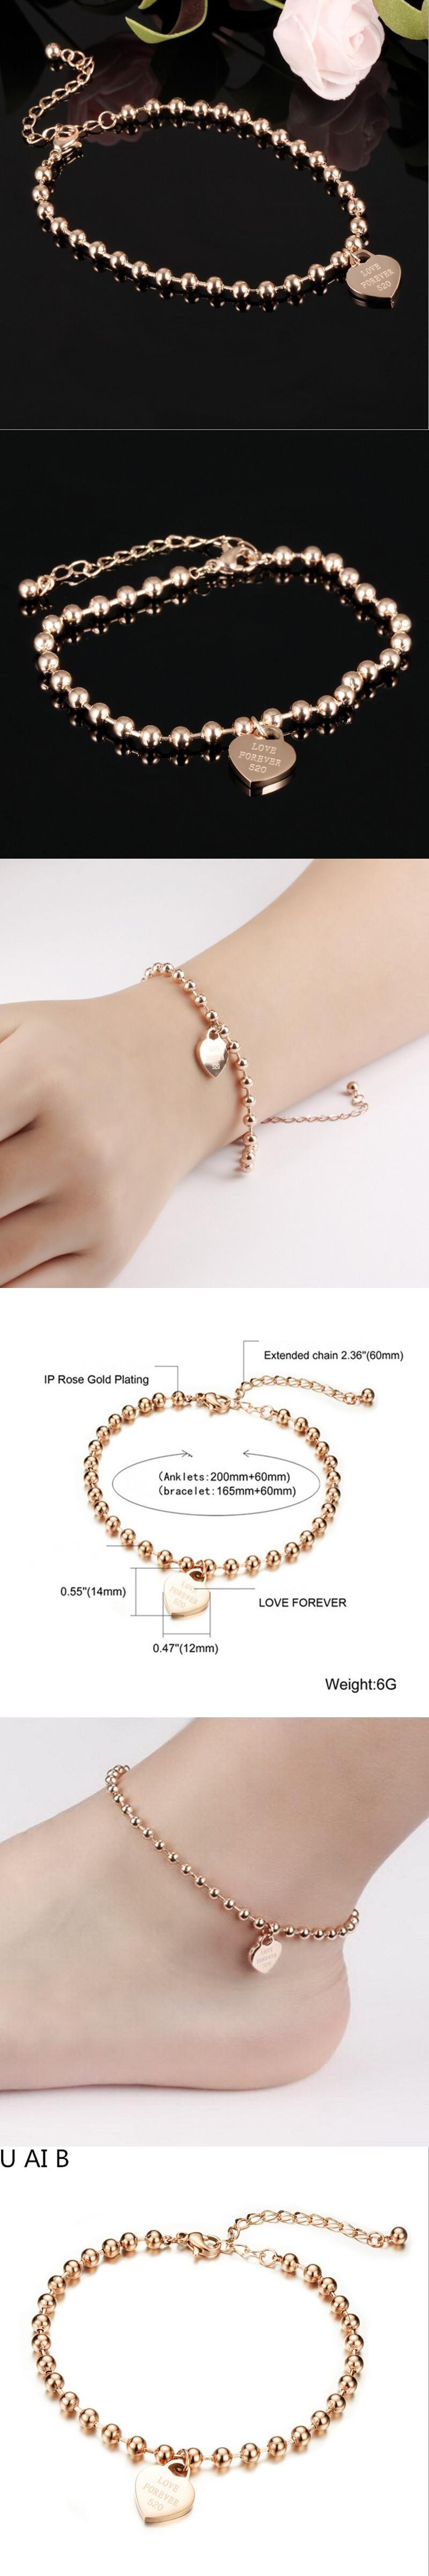 Simple Style Korean fashion love Anklets rose gold color titanium ...